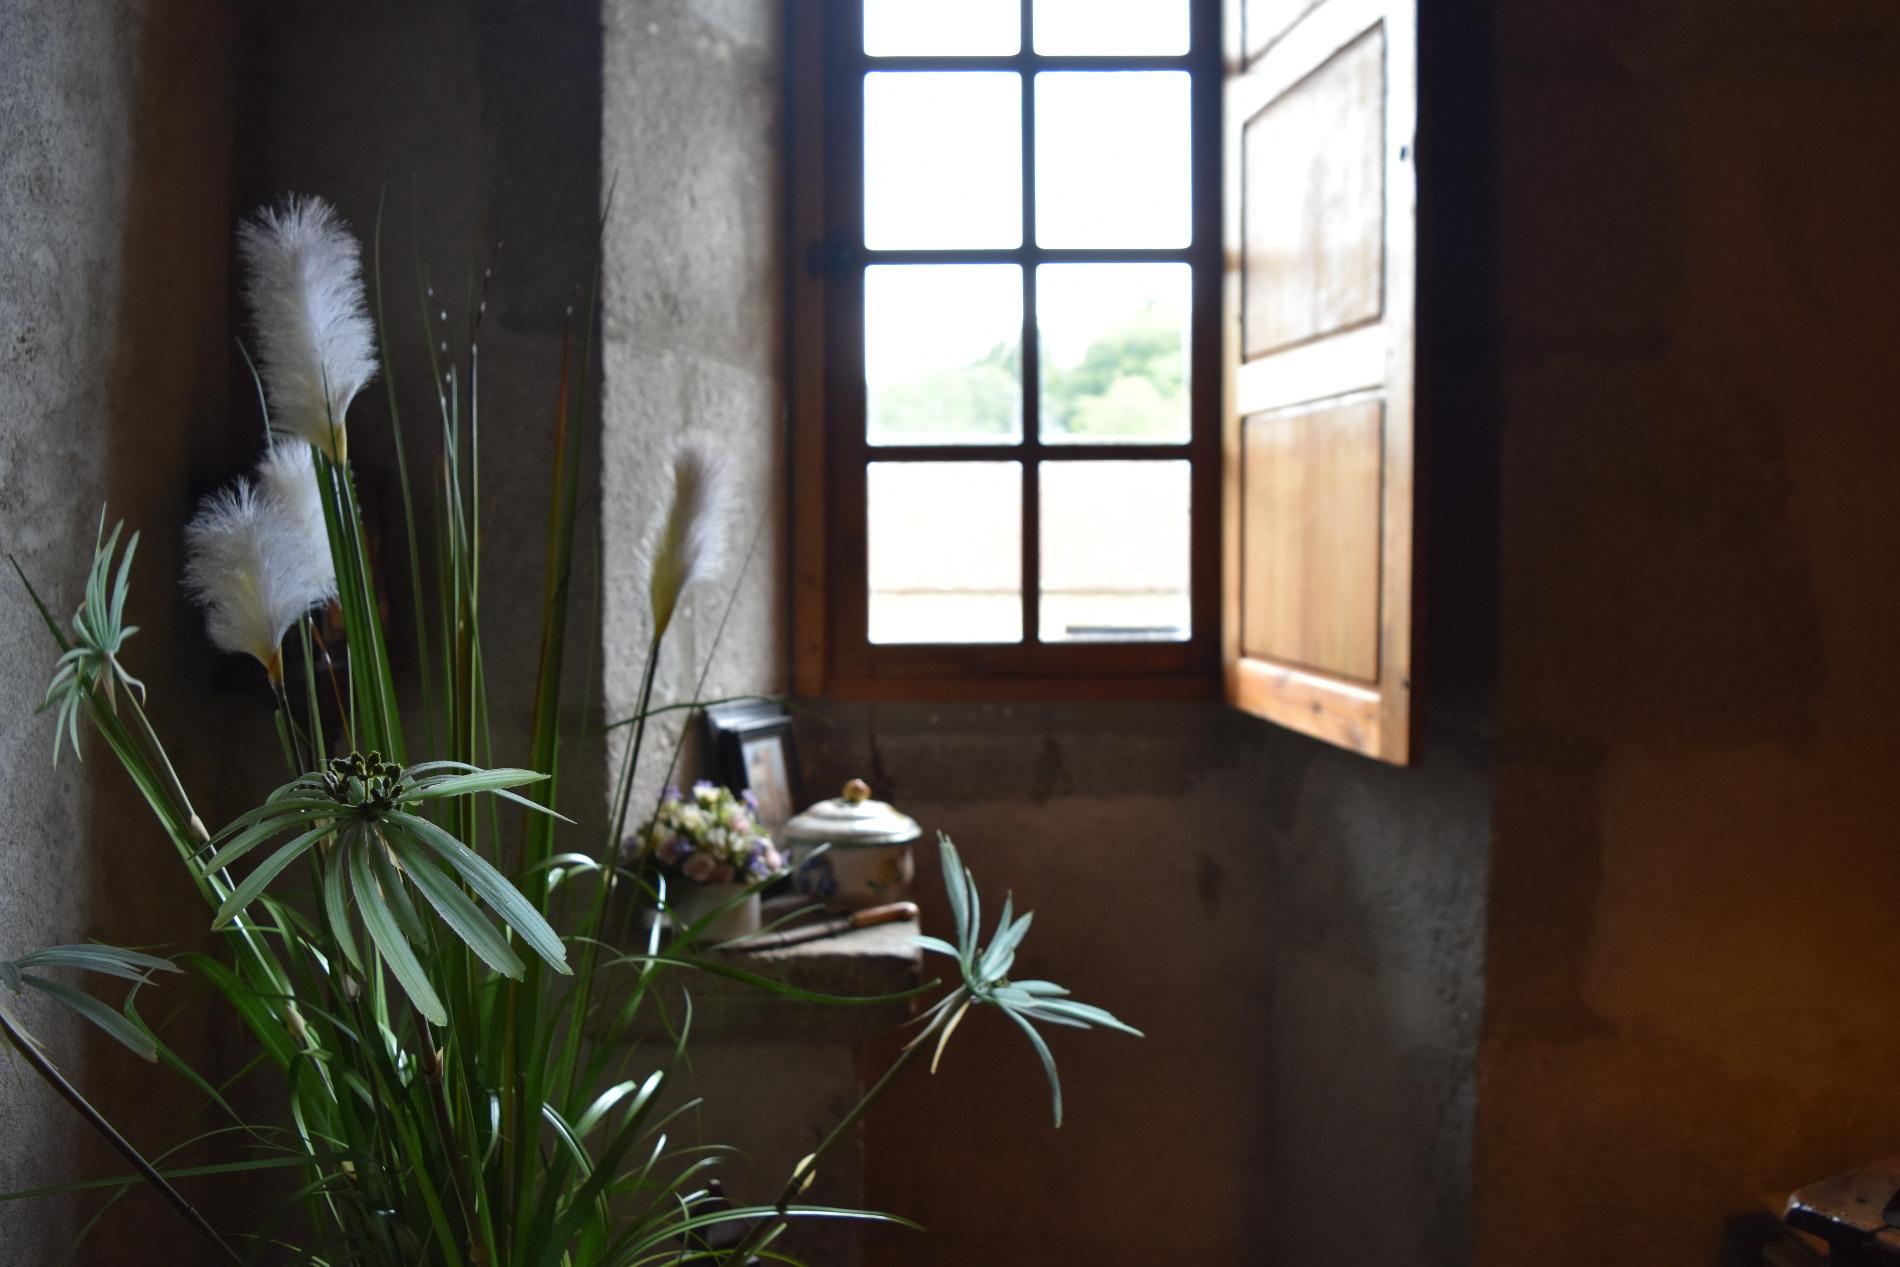 Houses For Sale in Dordogne